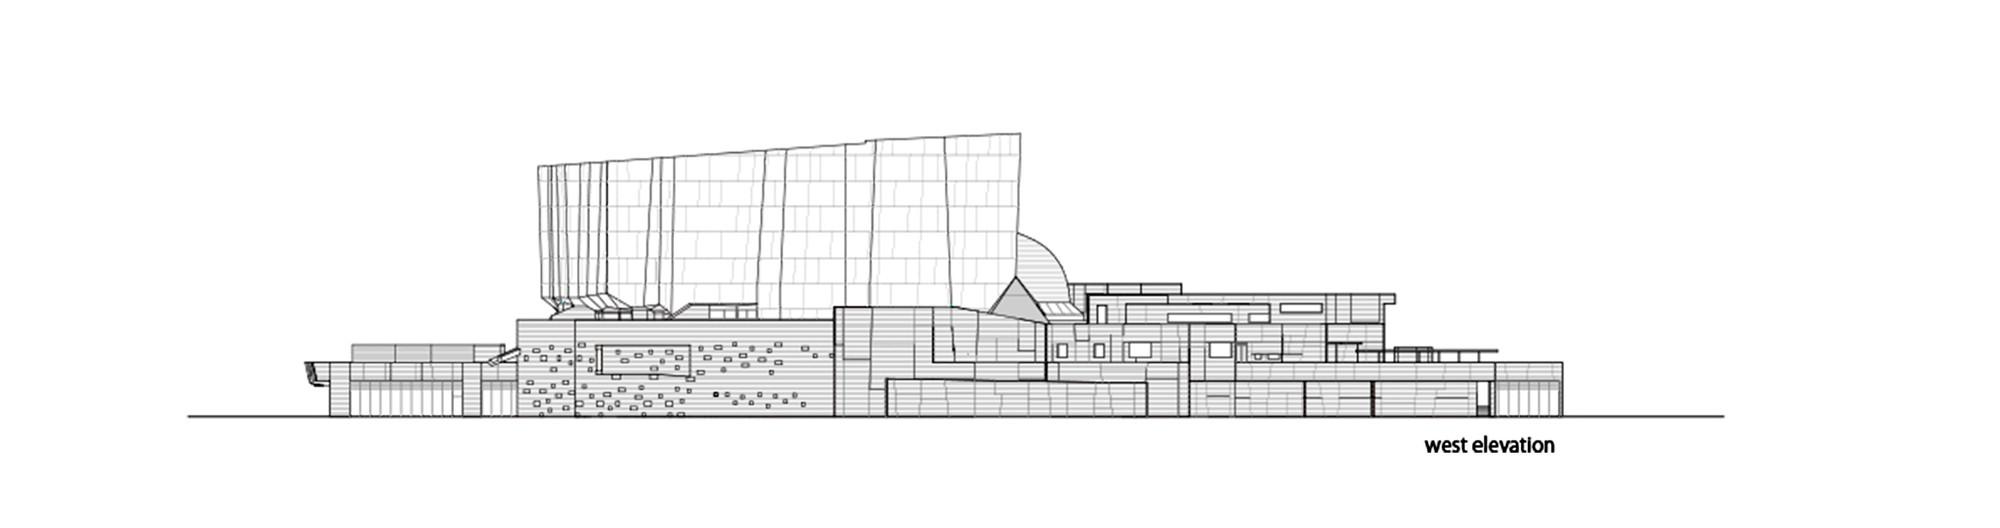 Architecture Design Elevation